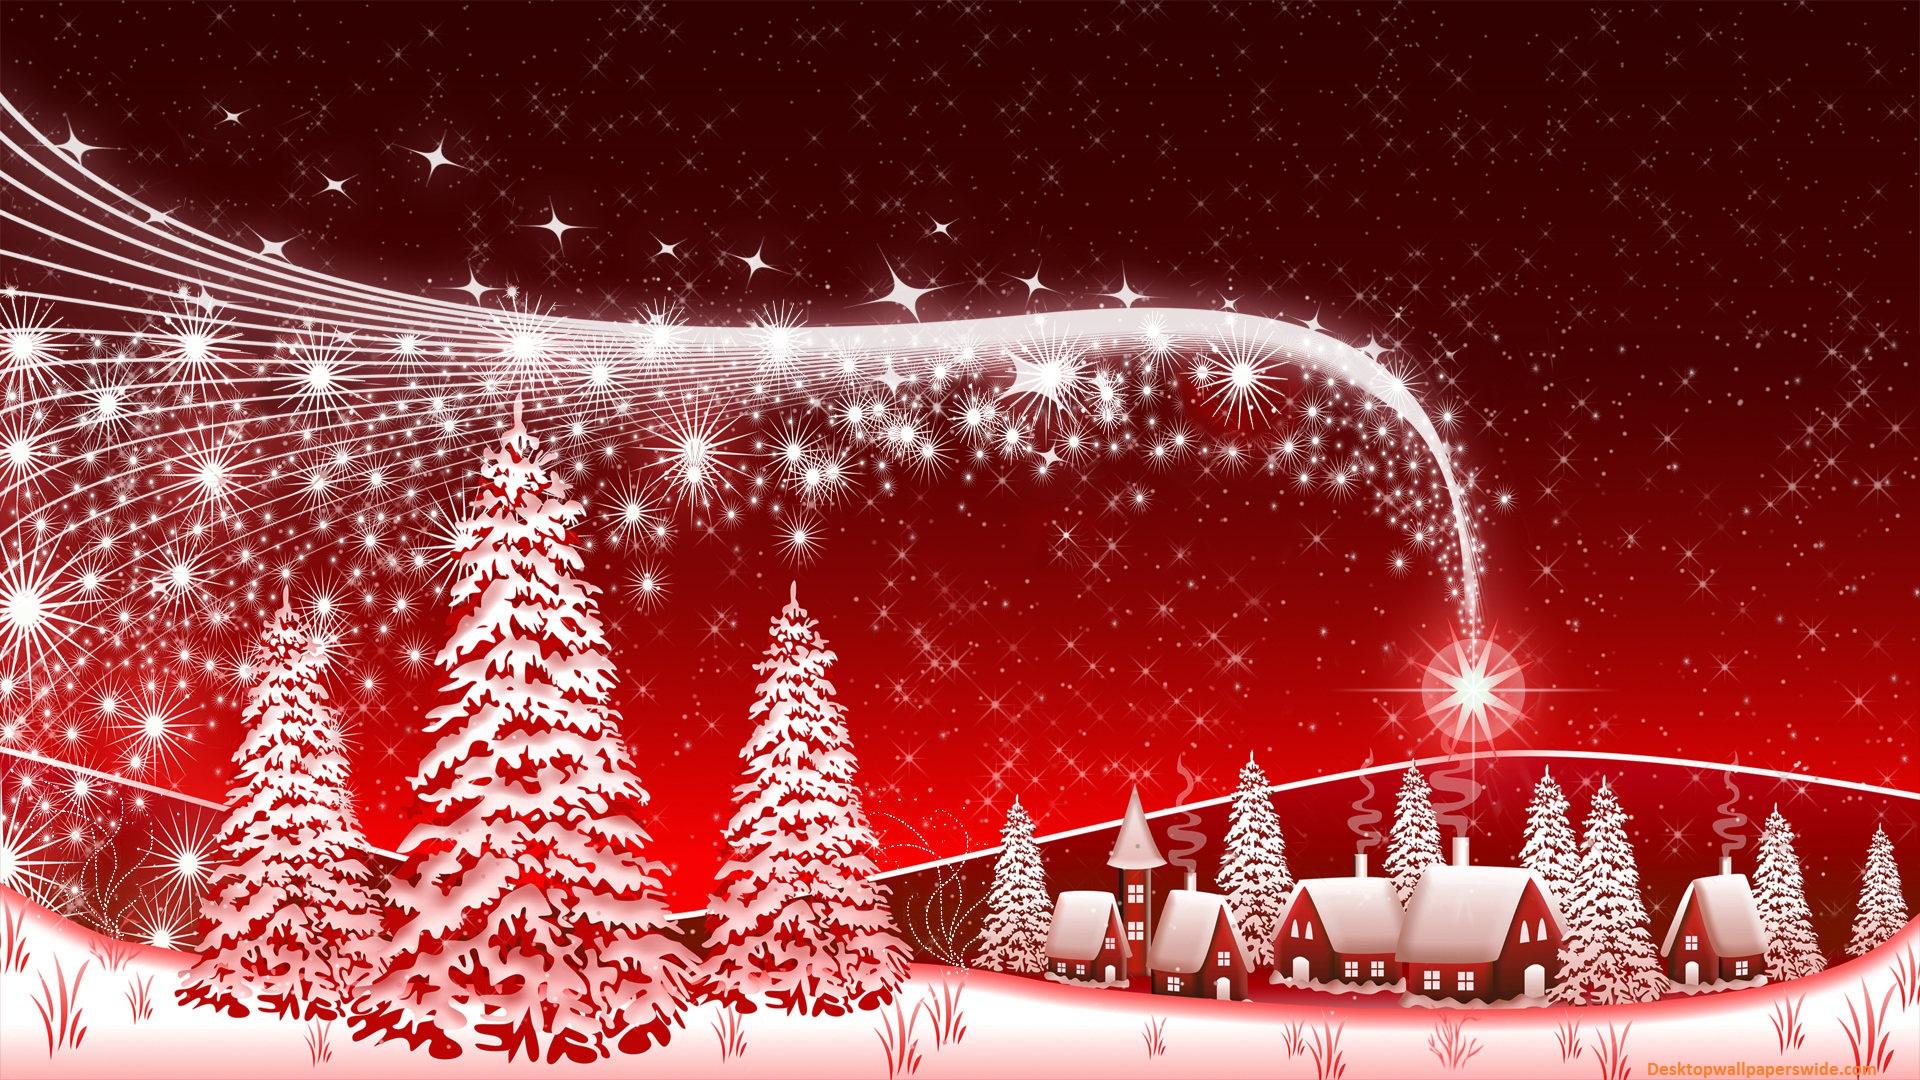 Christmas Desktop Wallpaper Gif